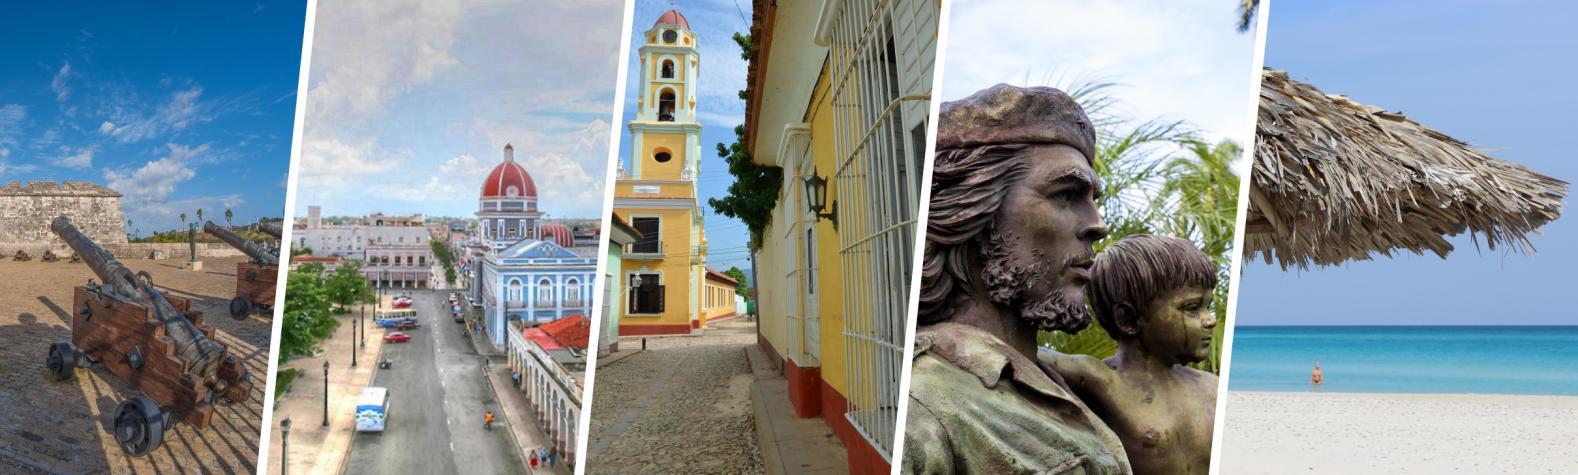 Mini colores y Aromas de Cuba (PQ2019-23 SUP) (PQ2020-23 SUP)